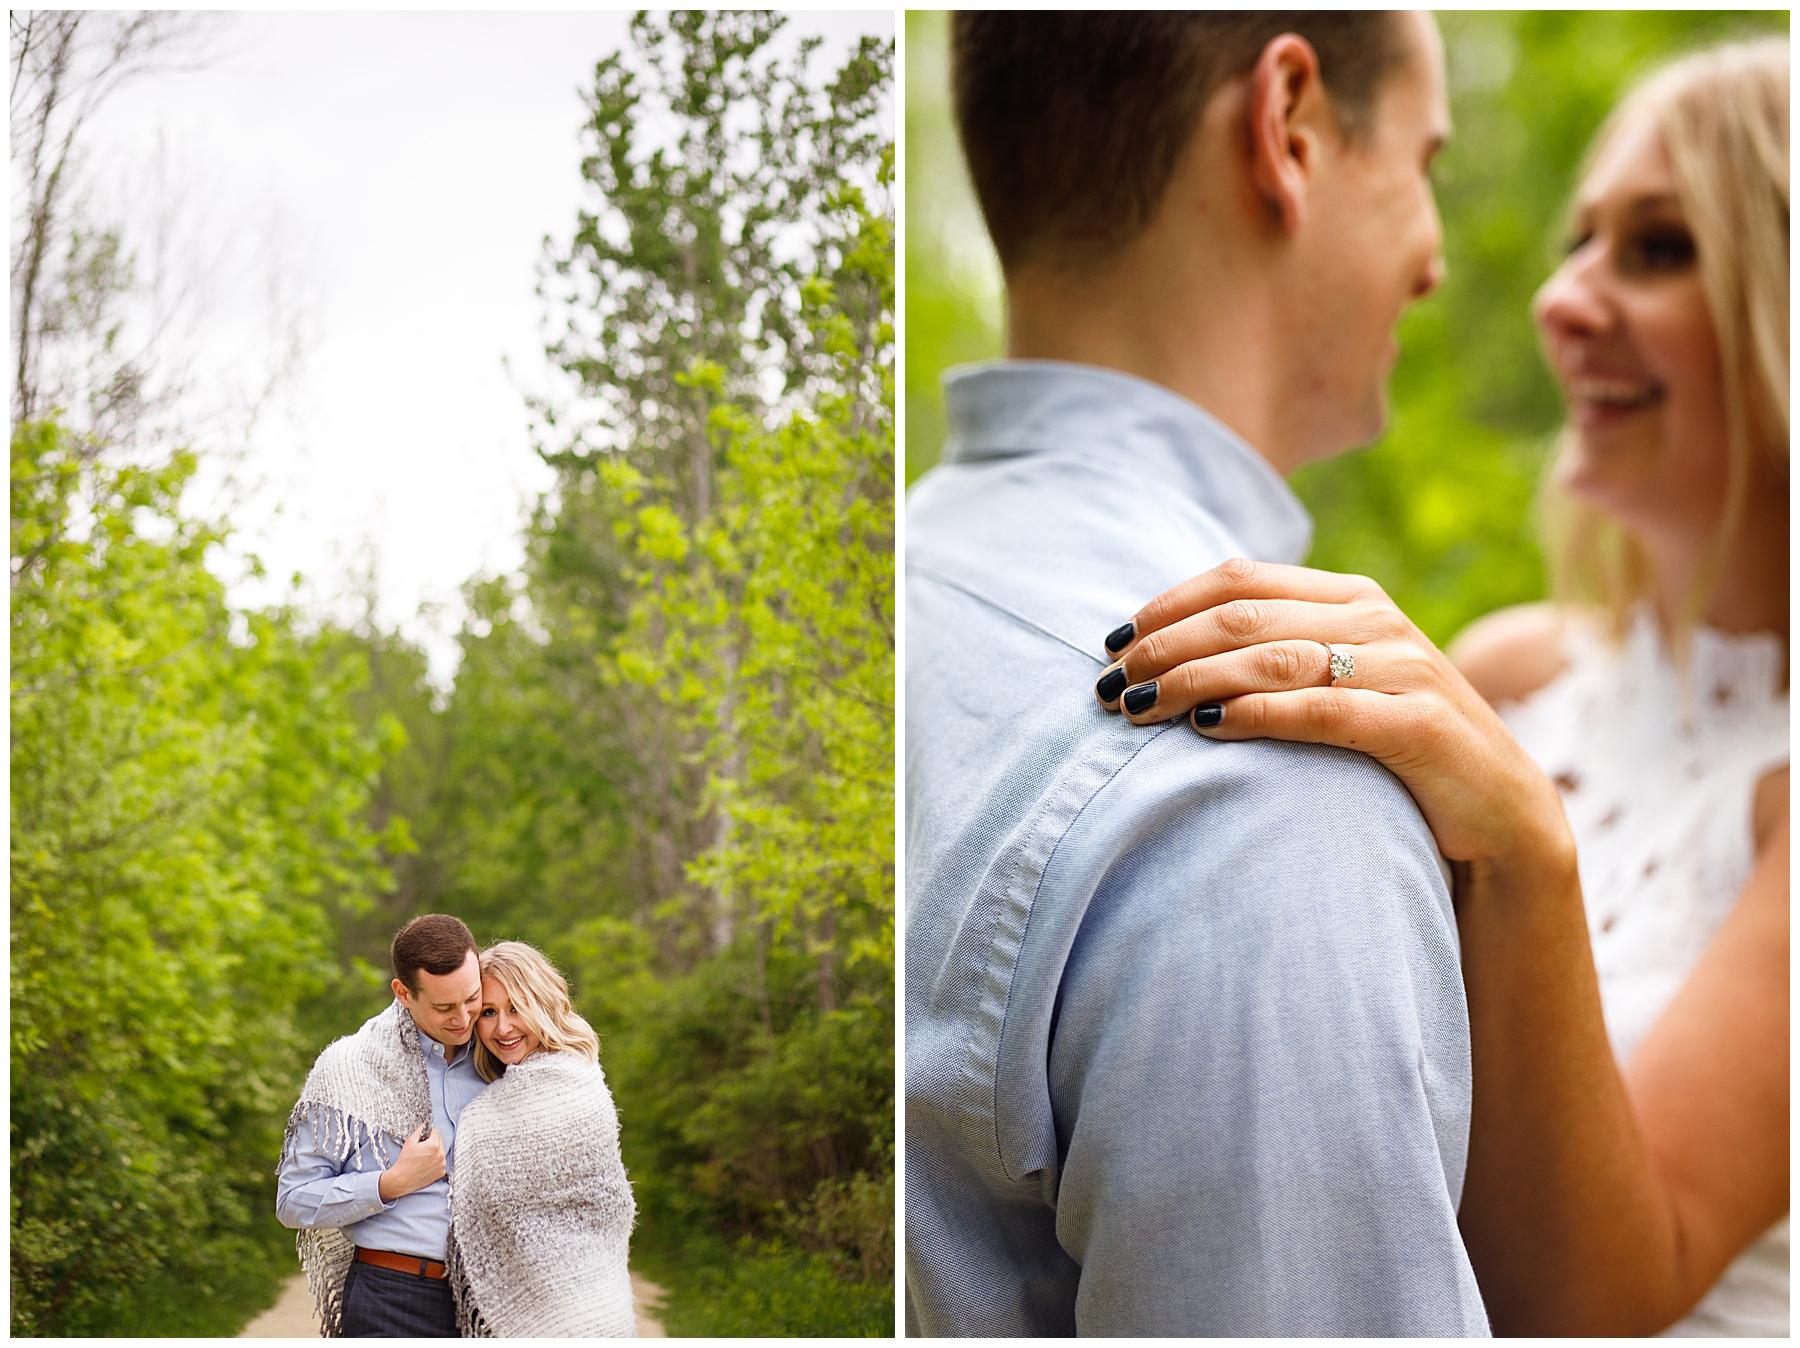 Hannah + Ben Engaged Milwaukee_0009.jpg